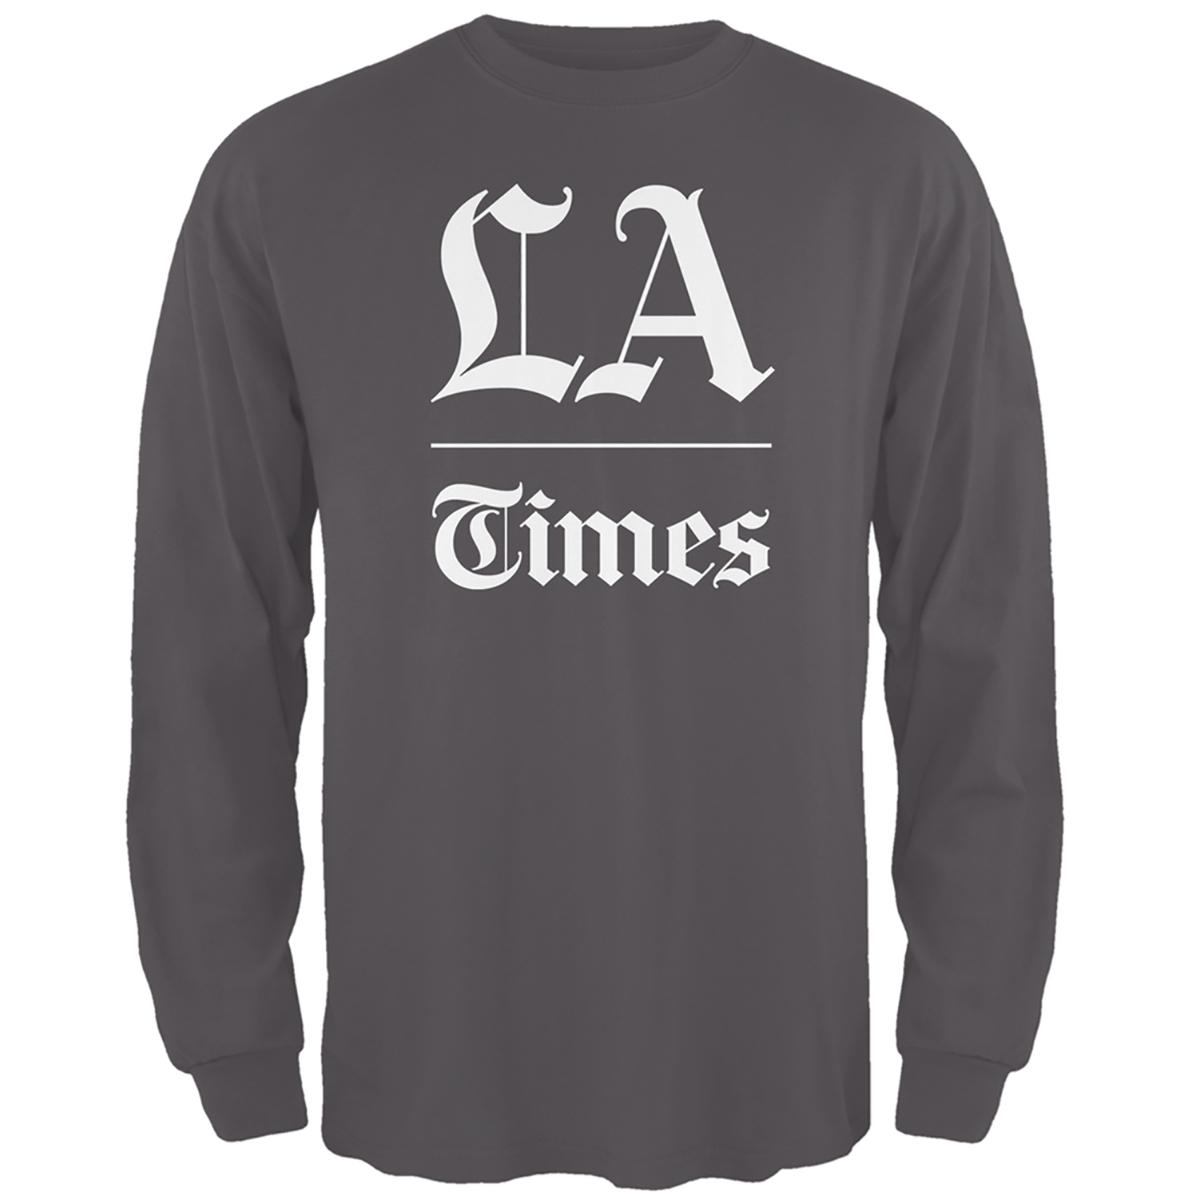 L.A. Times Stacked Logo Dark Grey Long Sleeve Shirt